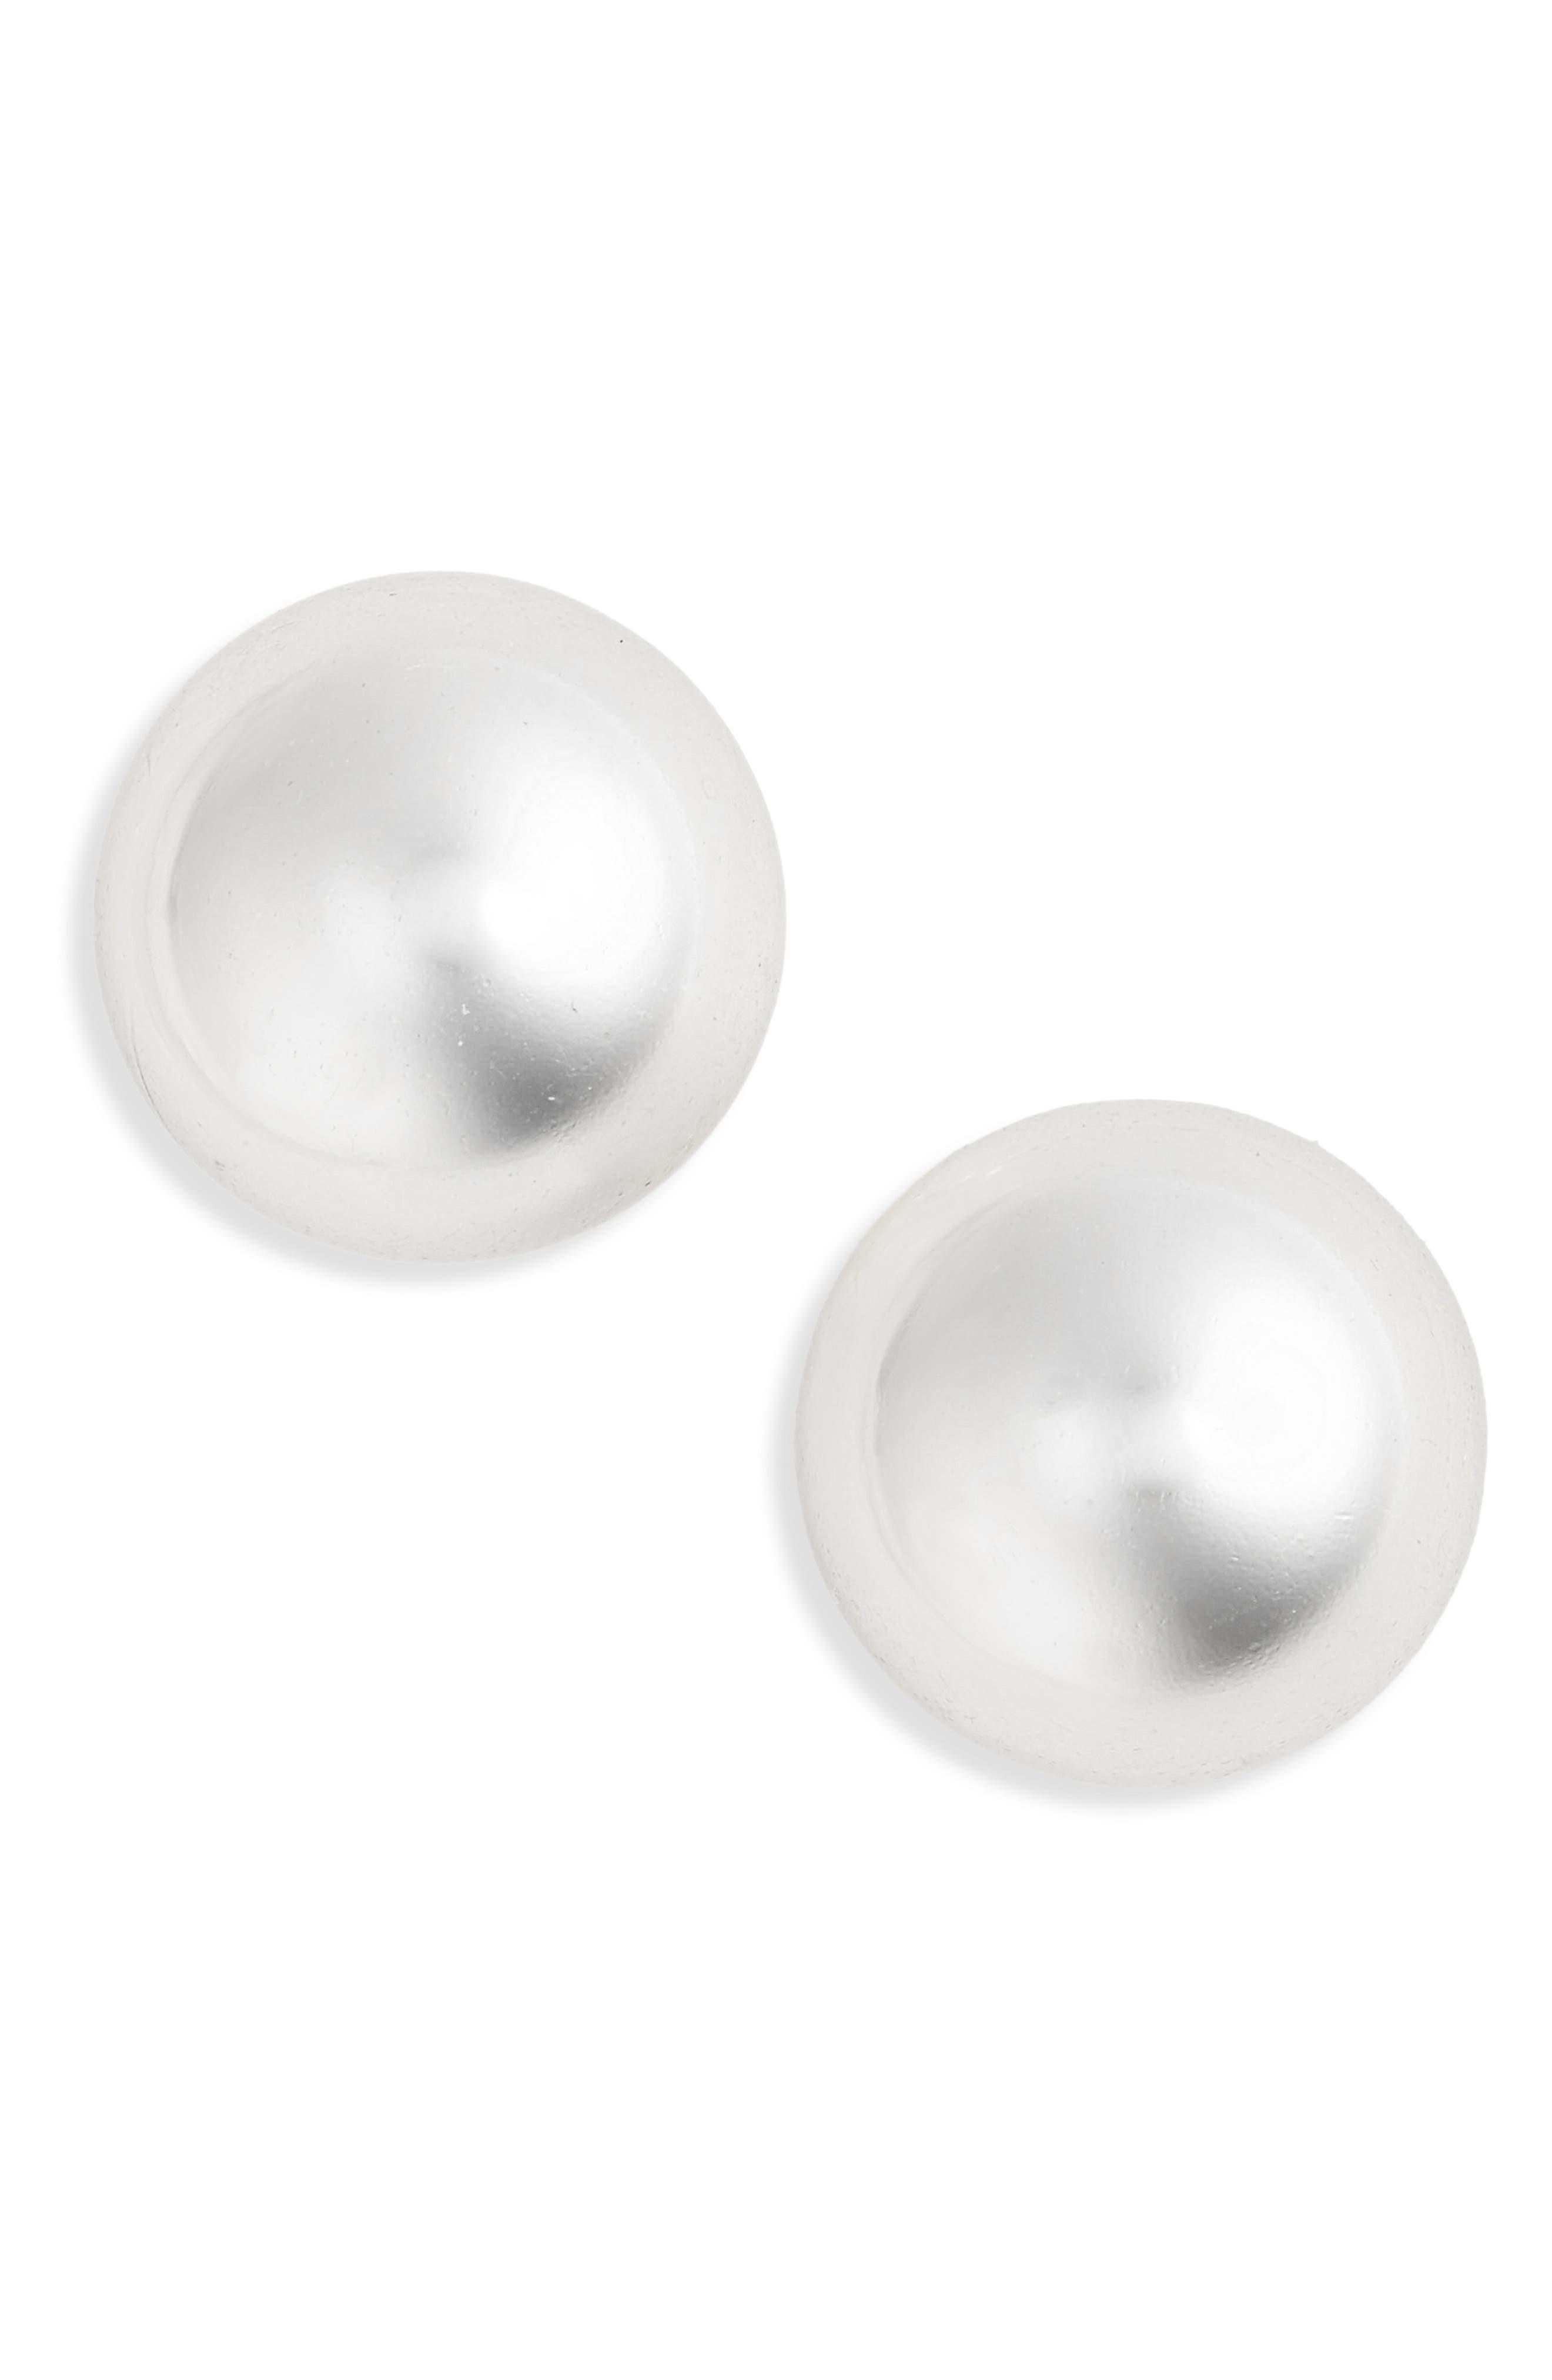 Ball Stud Earrings,                         Main,                         color, SILVER